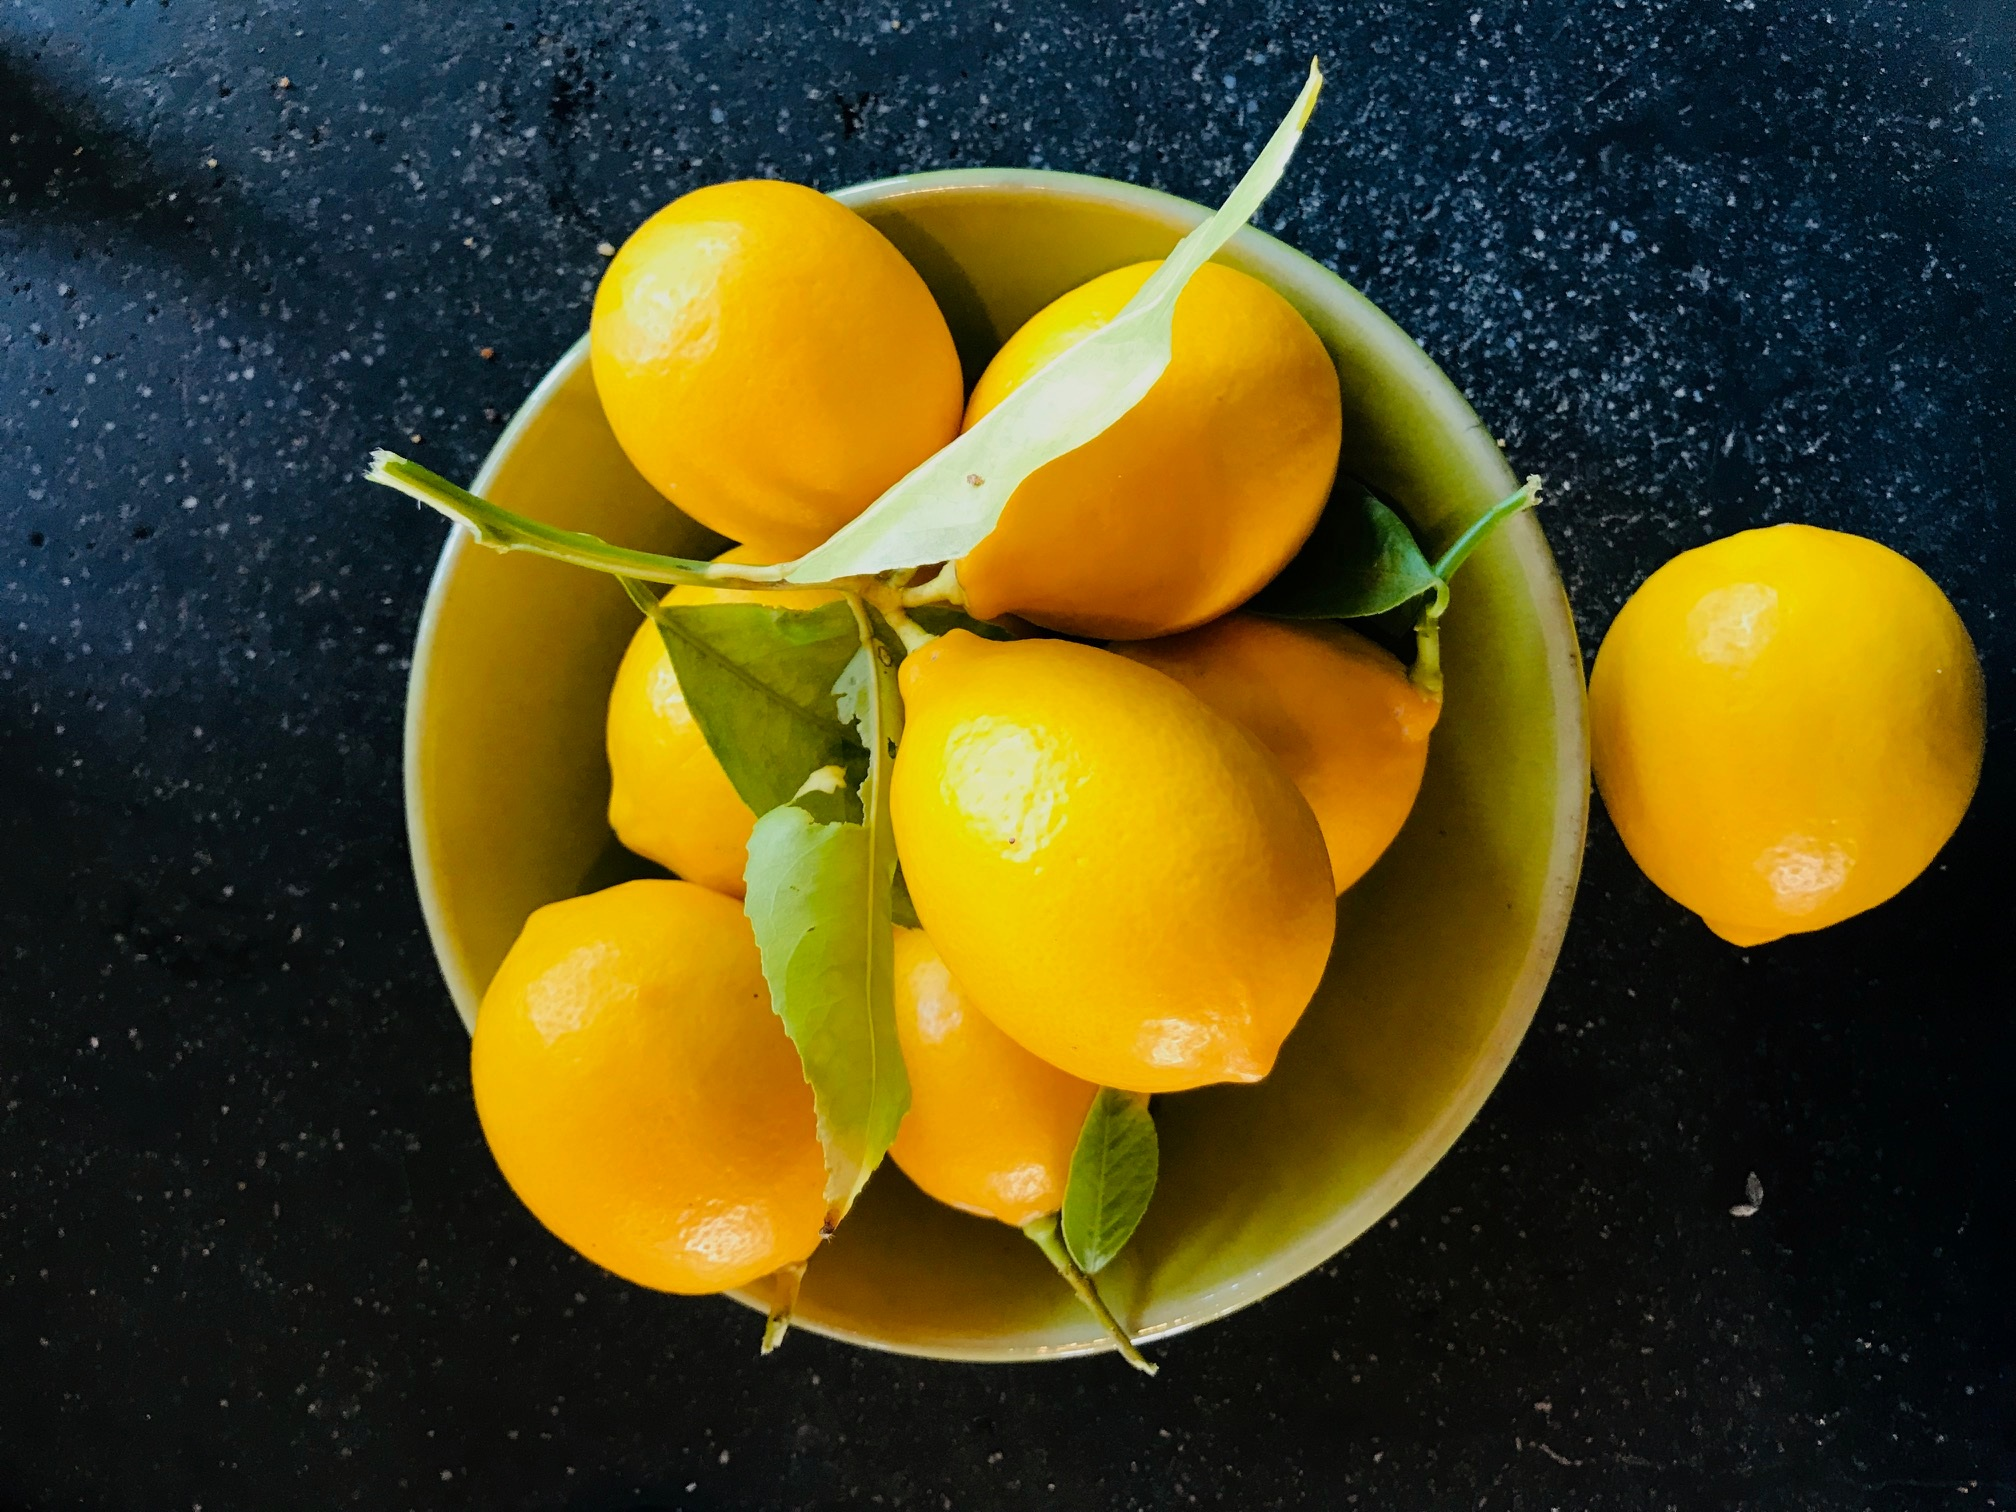 Lemons from my tree